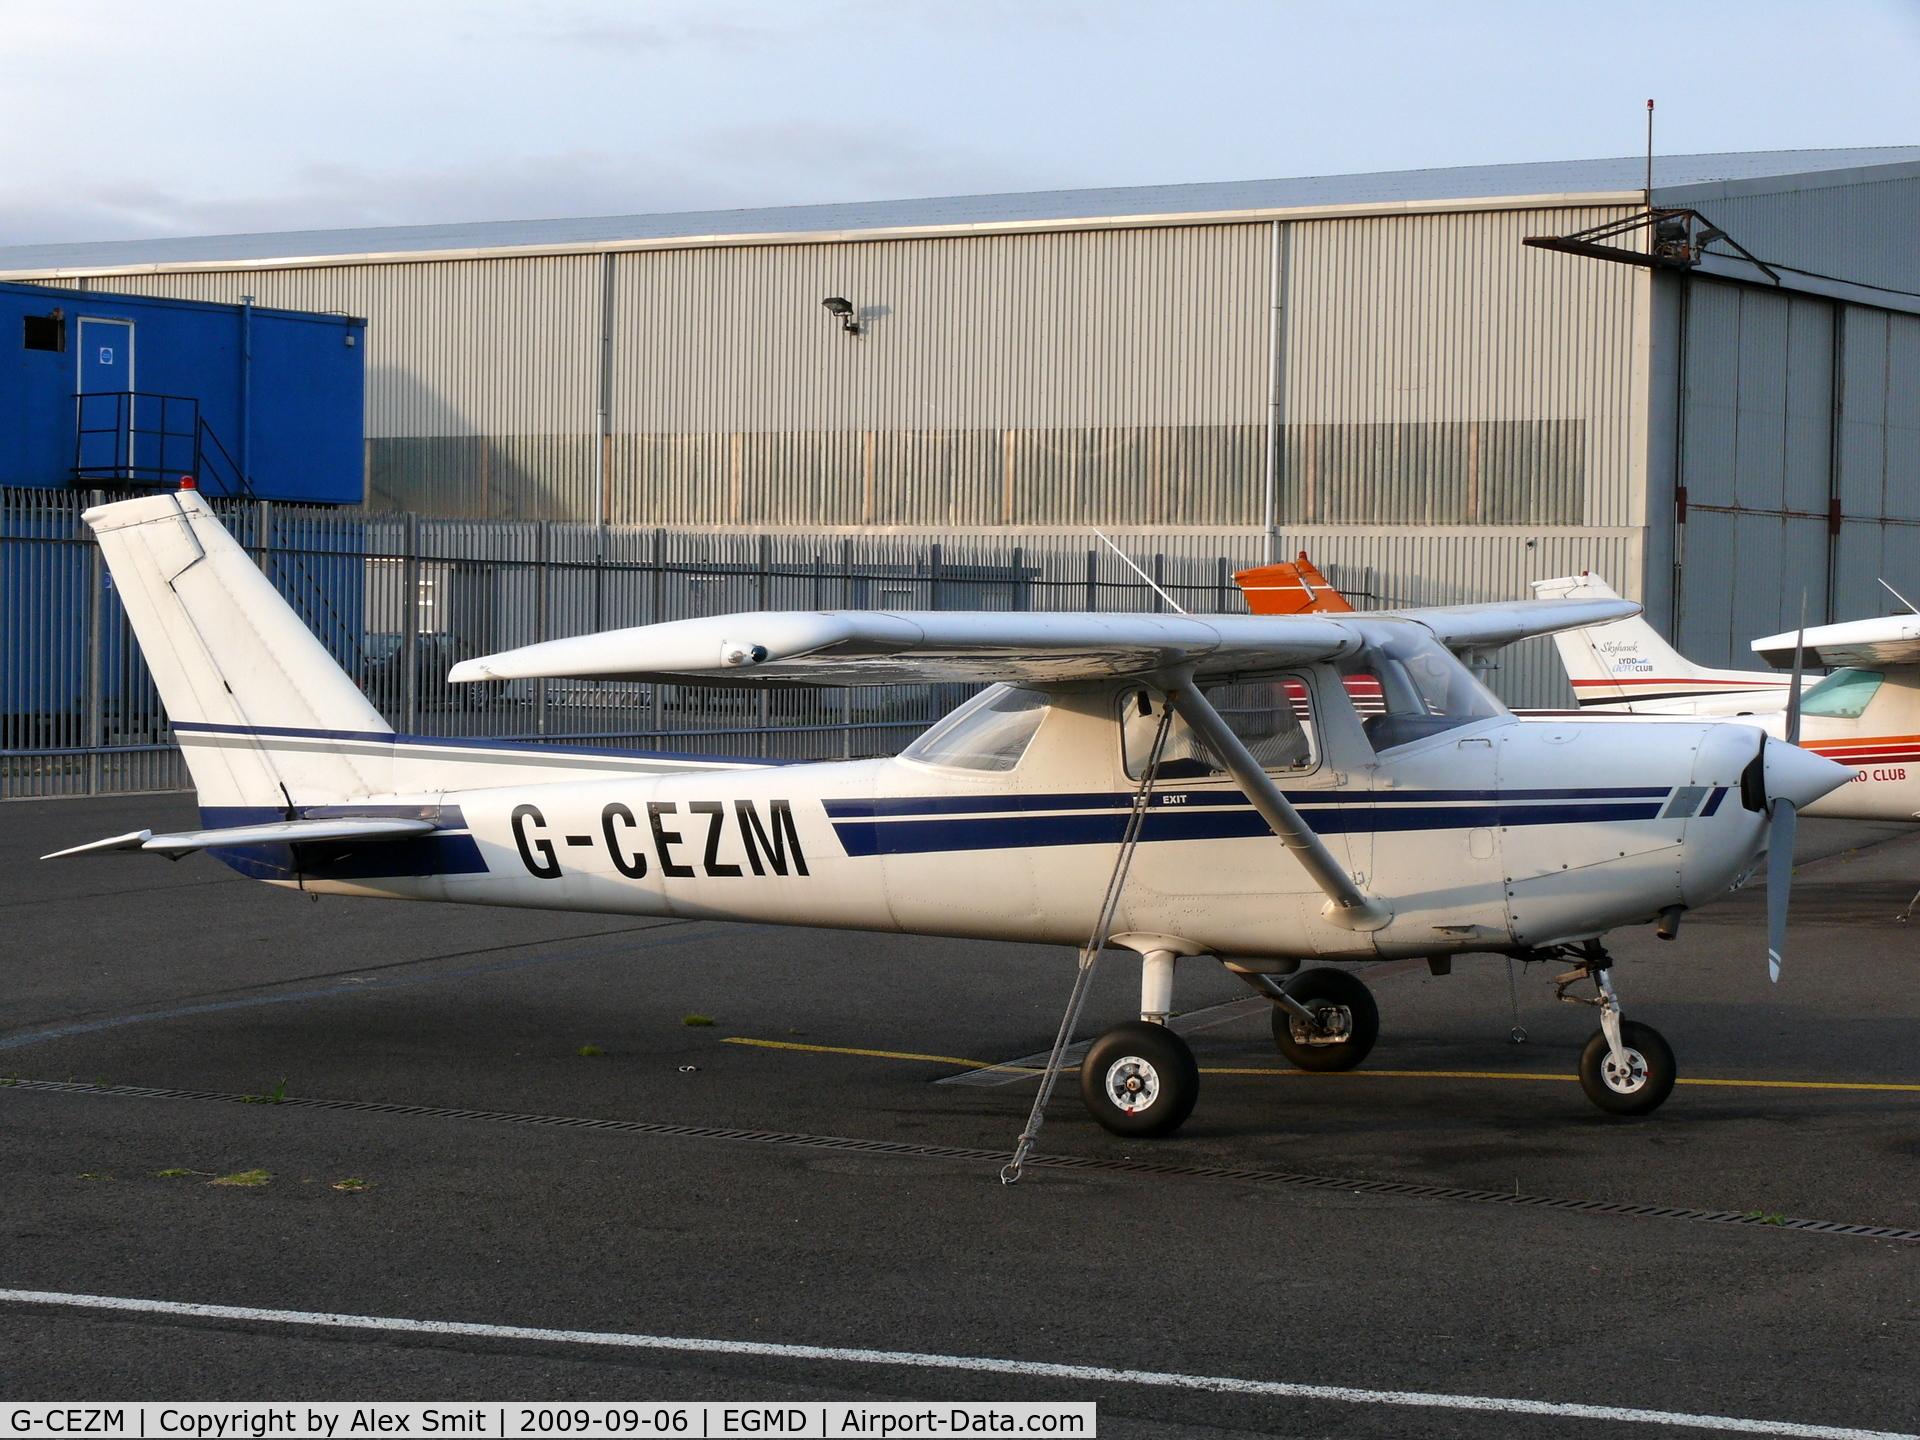 G-CEZM, 1981 Cessna 152 C/N 15285179, Cessna CF152 G-CEZM Chirstal Air Ltd